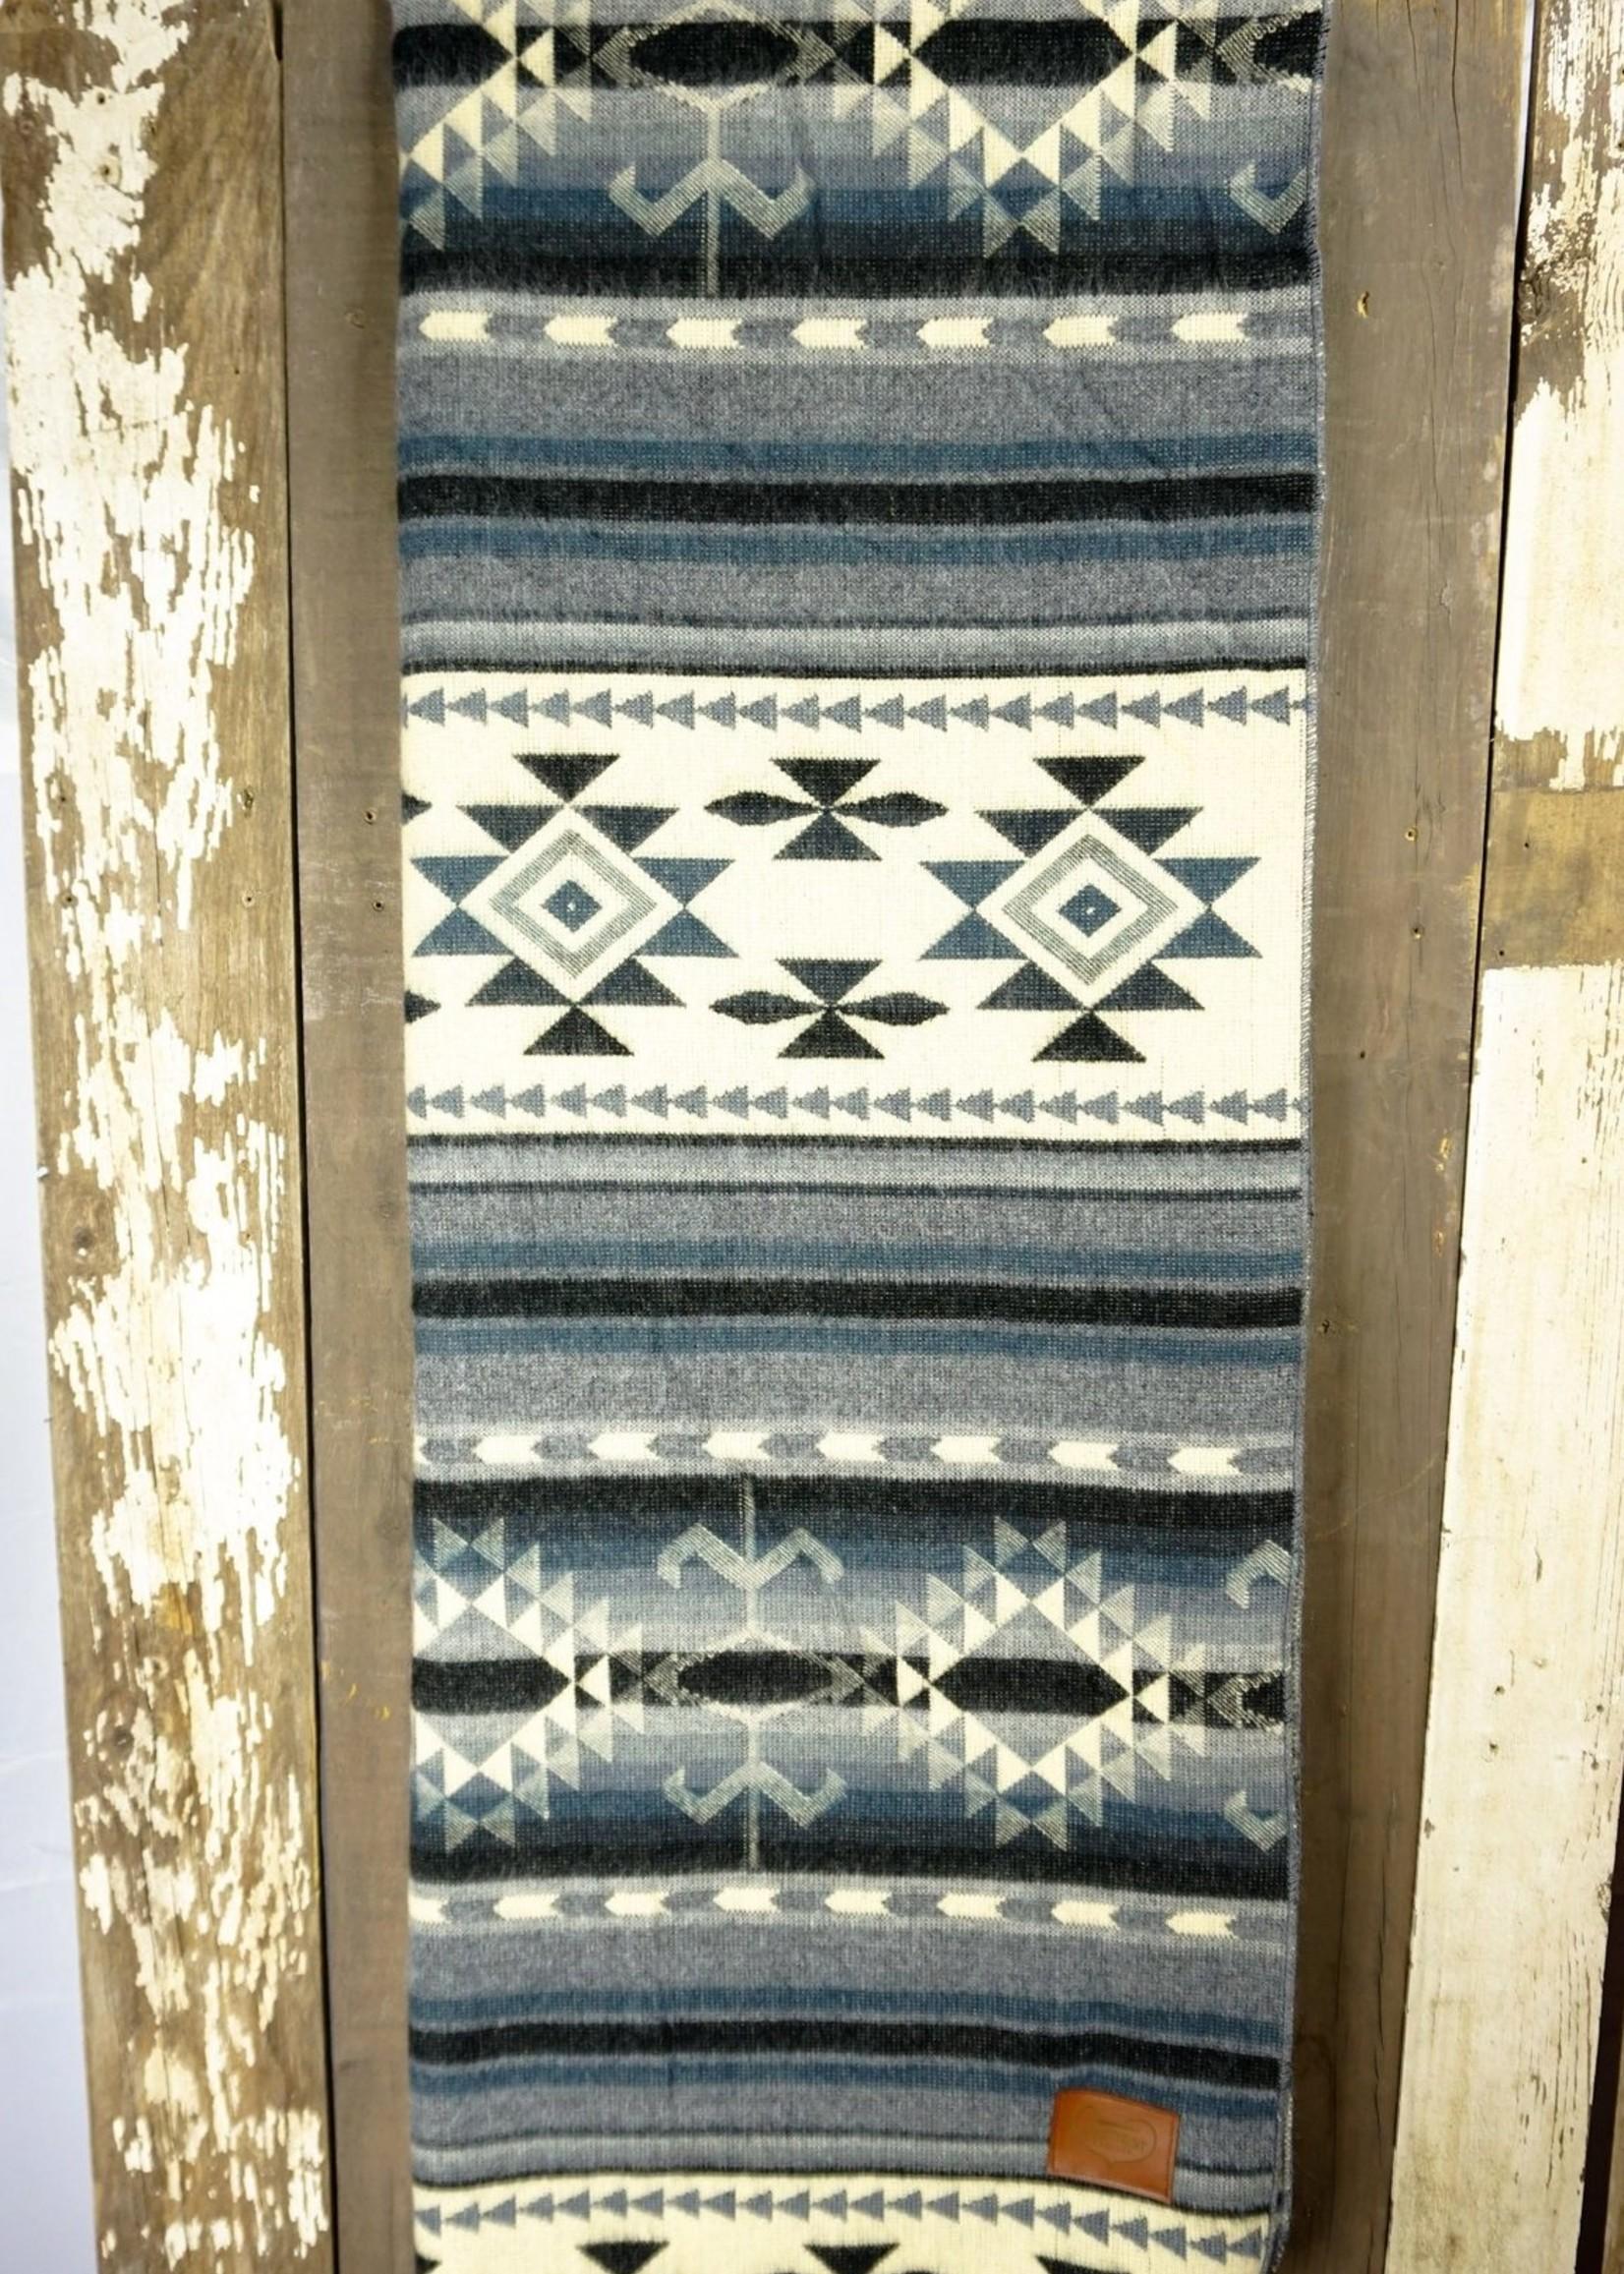 Heartprint Threads Ocean Layers Aztec Blanket   Double